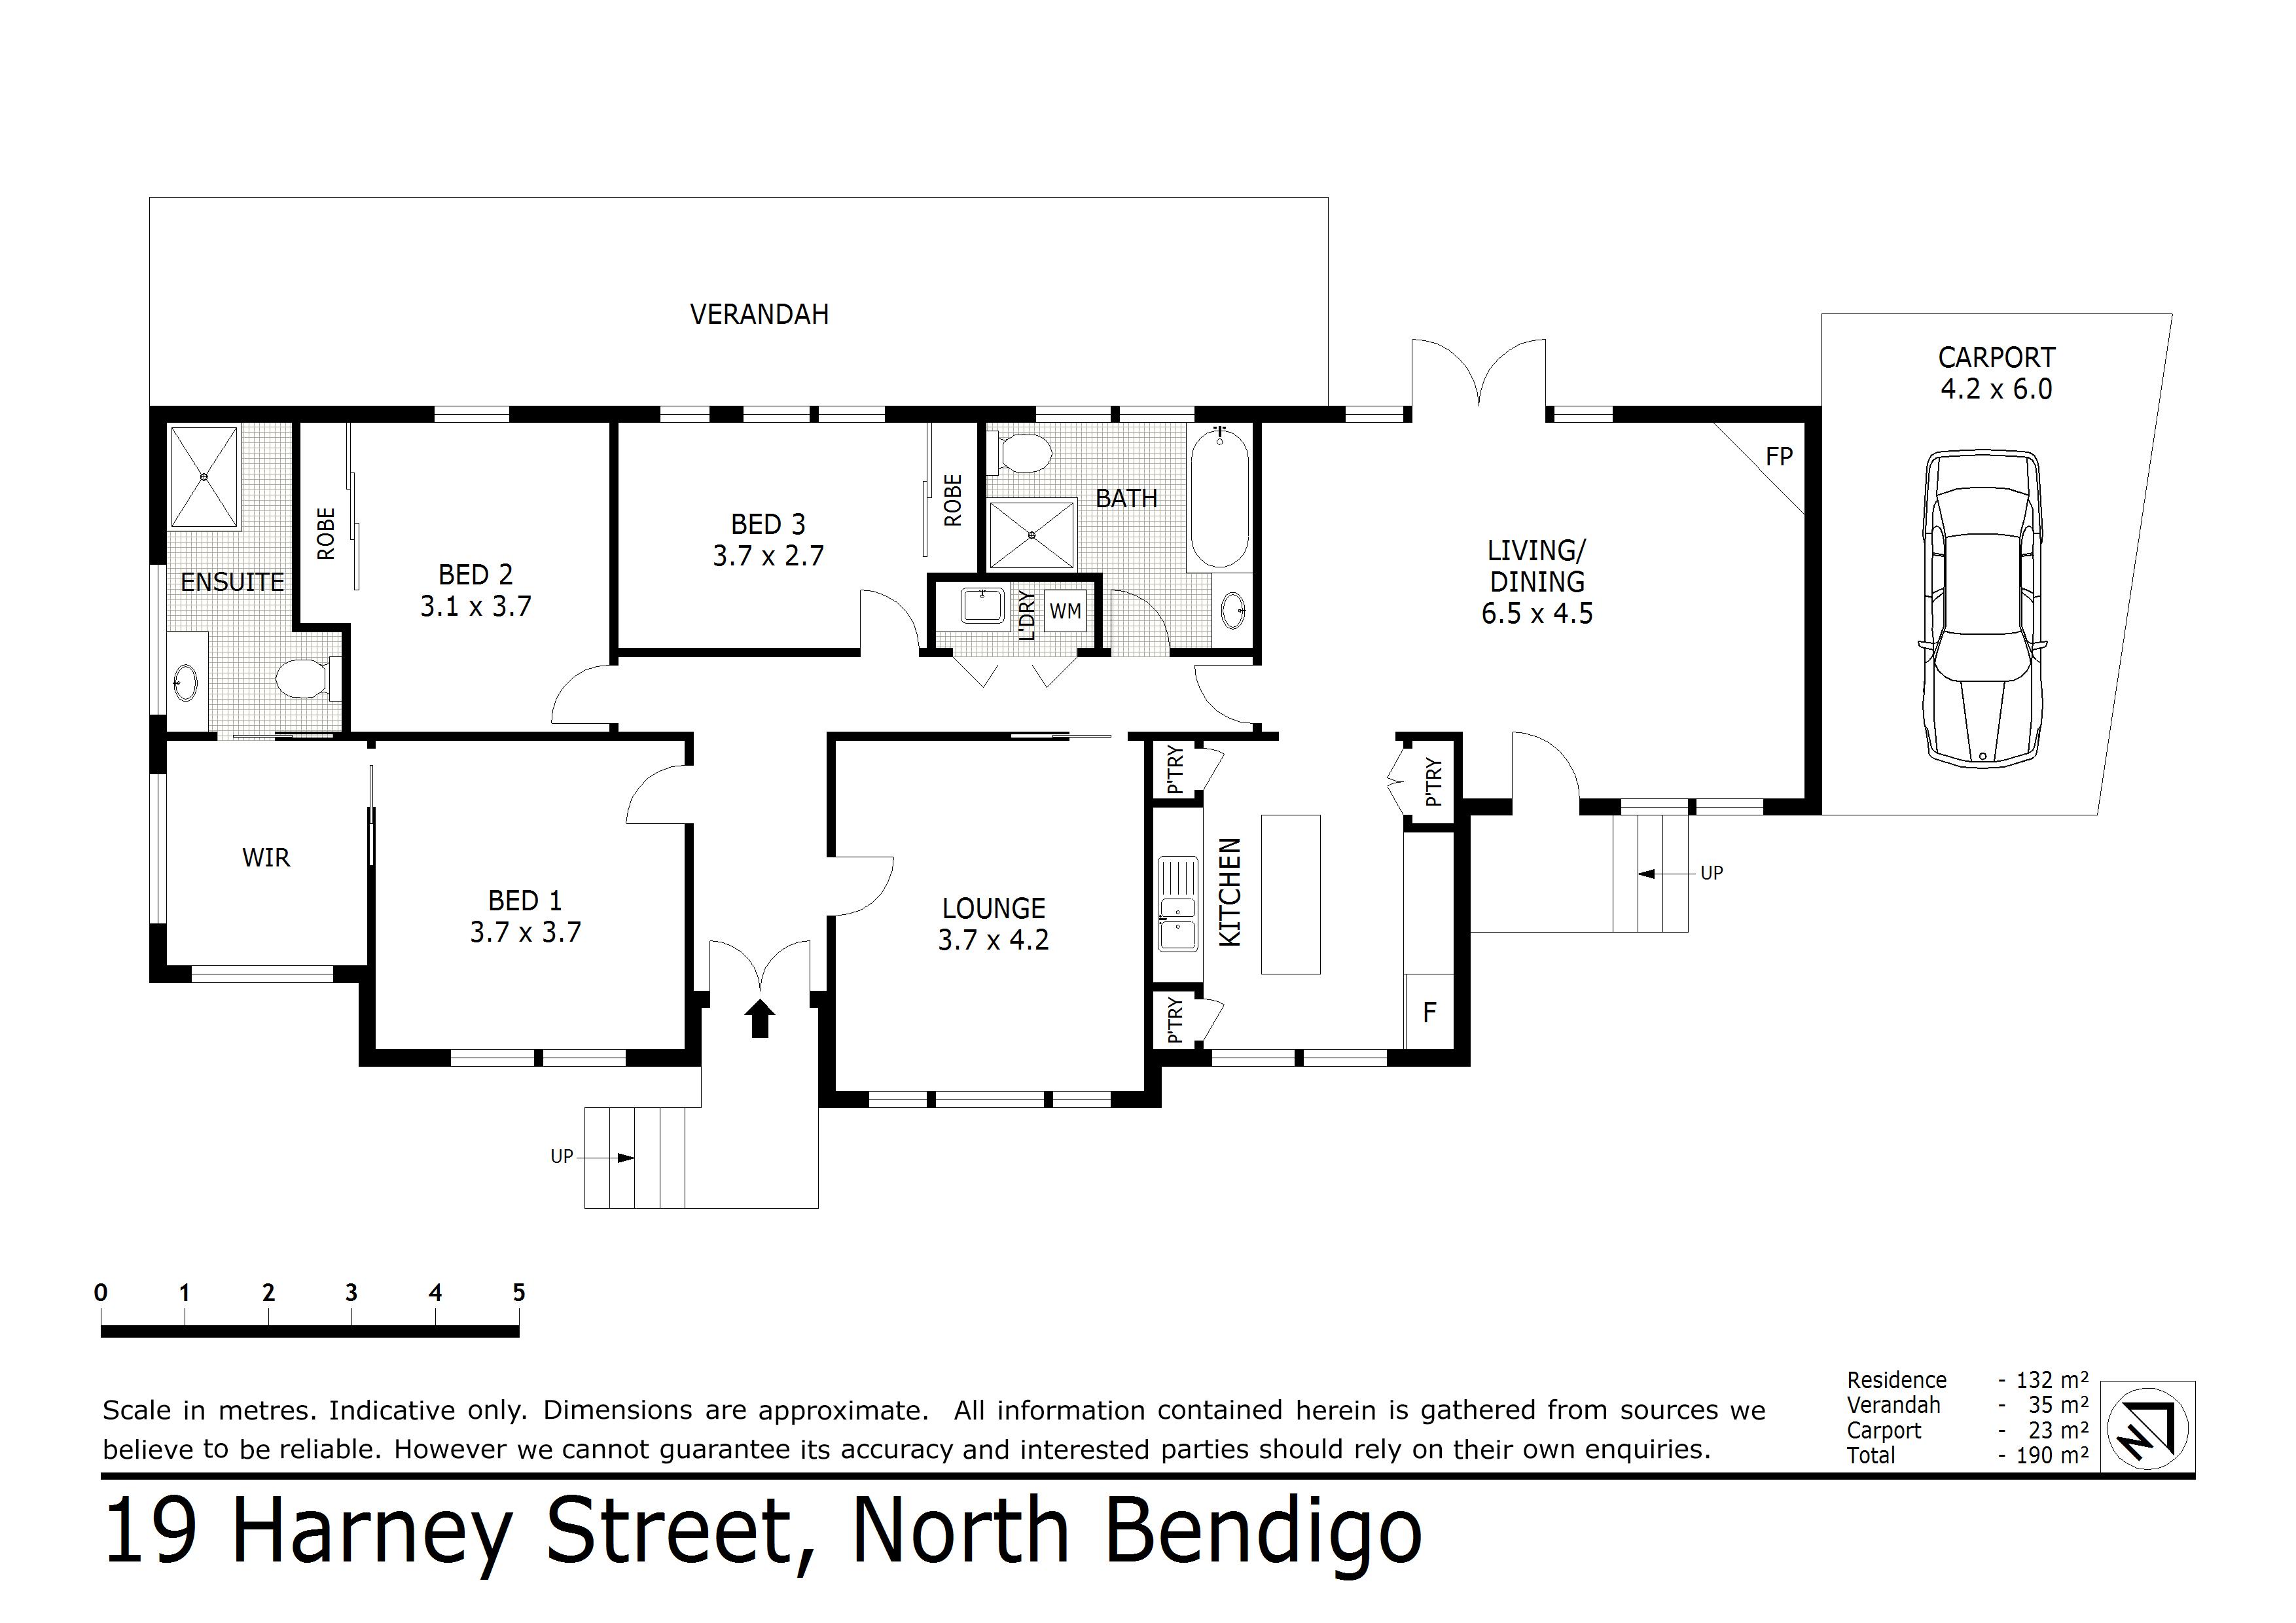 19 Harney Street, North Bendigo, VIC 3550